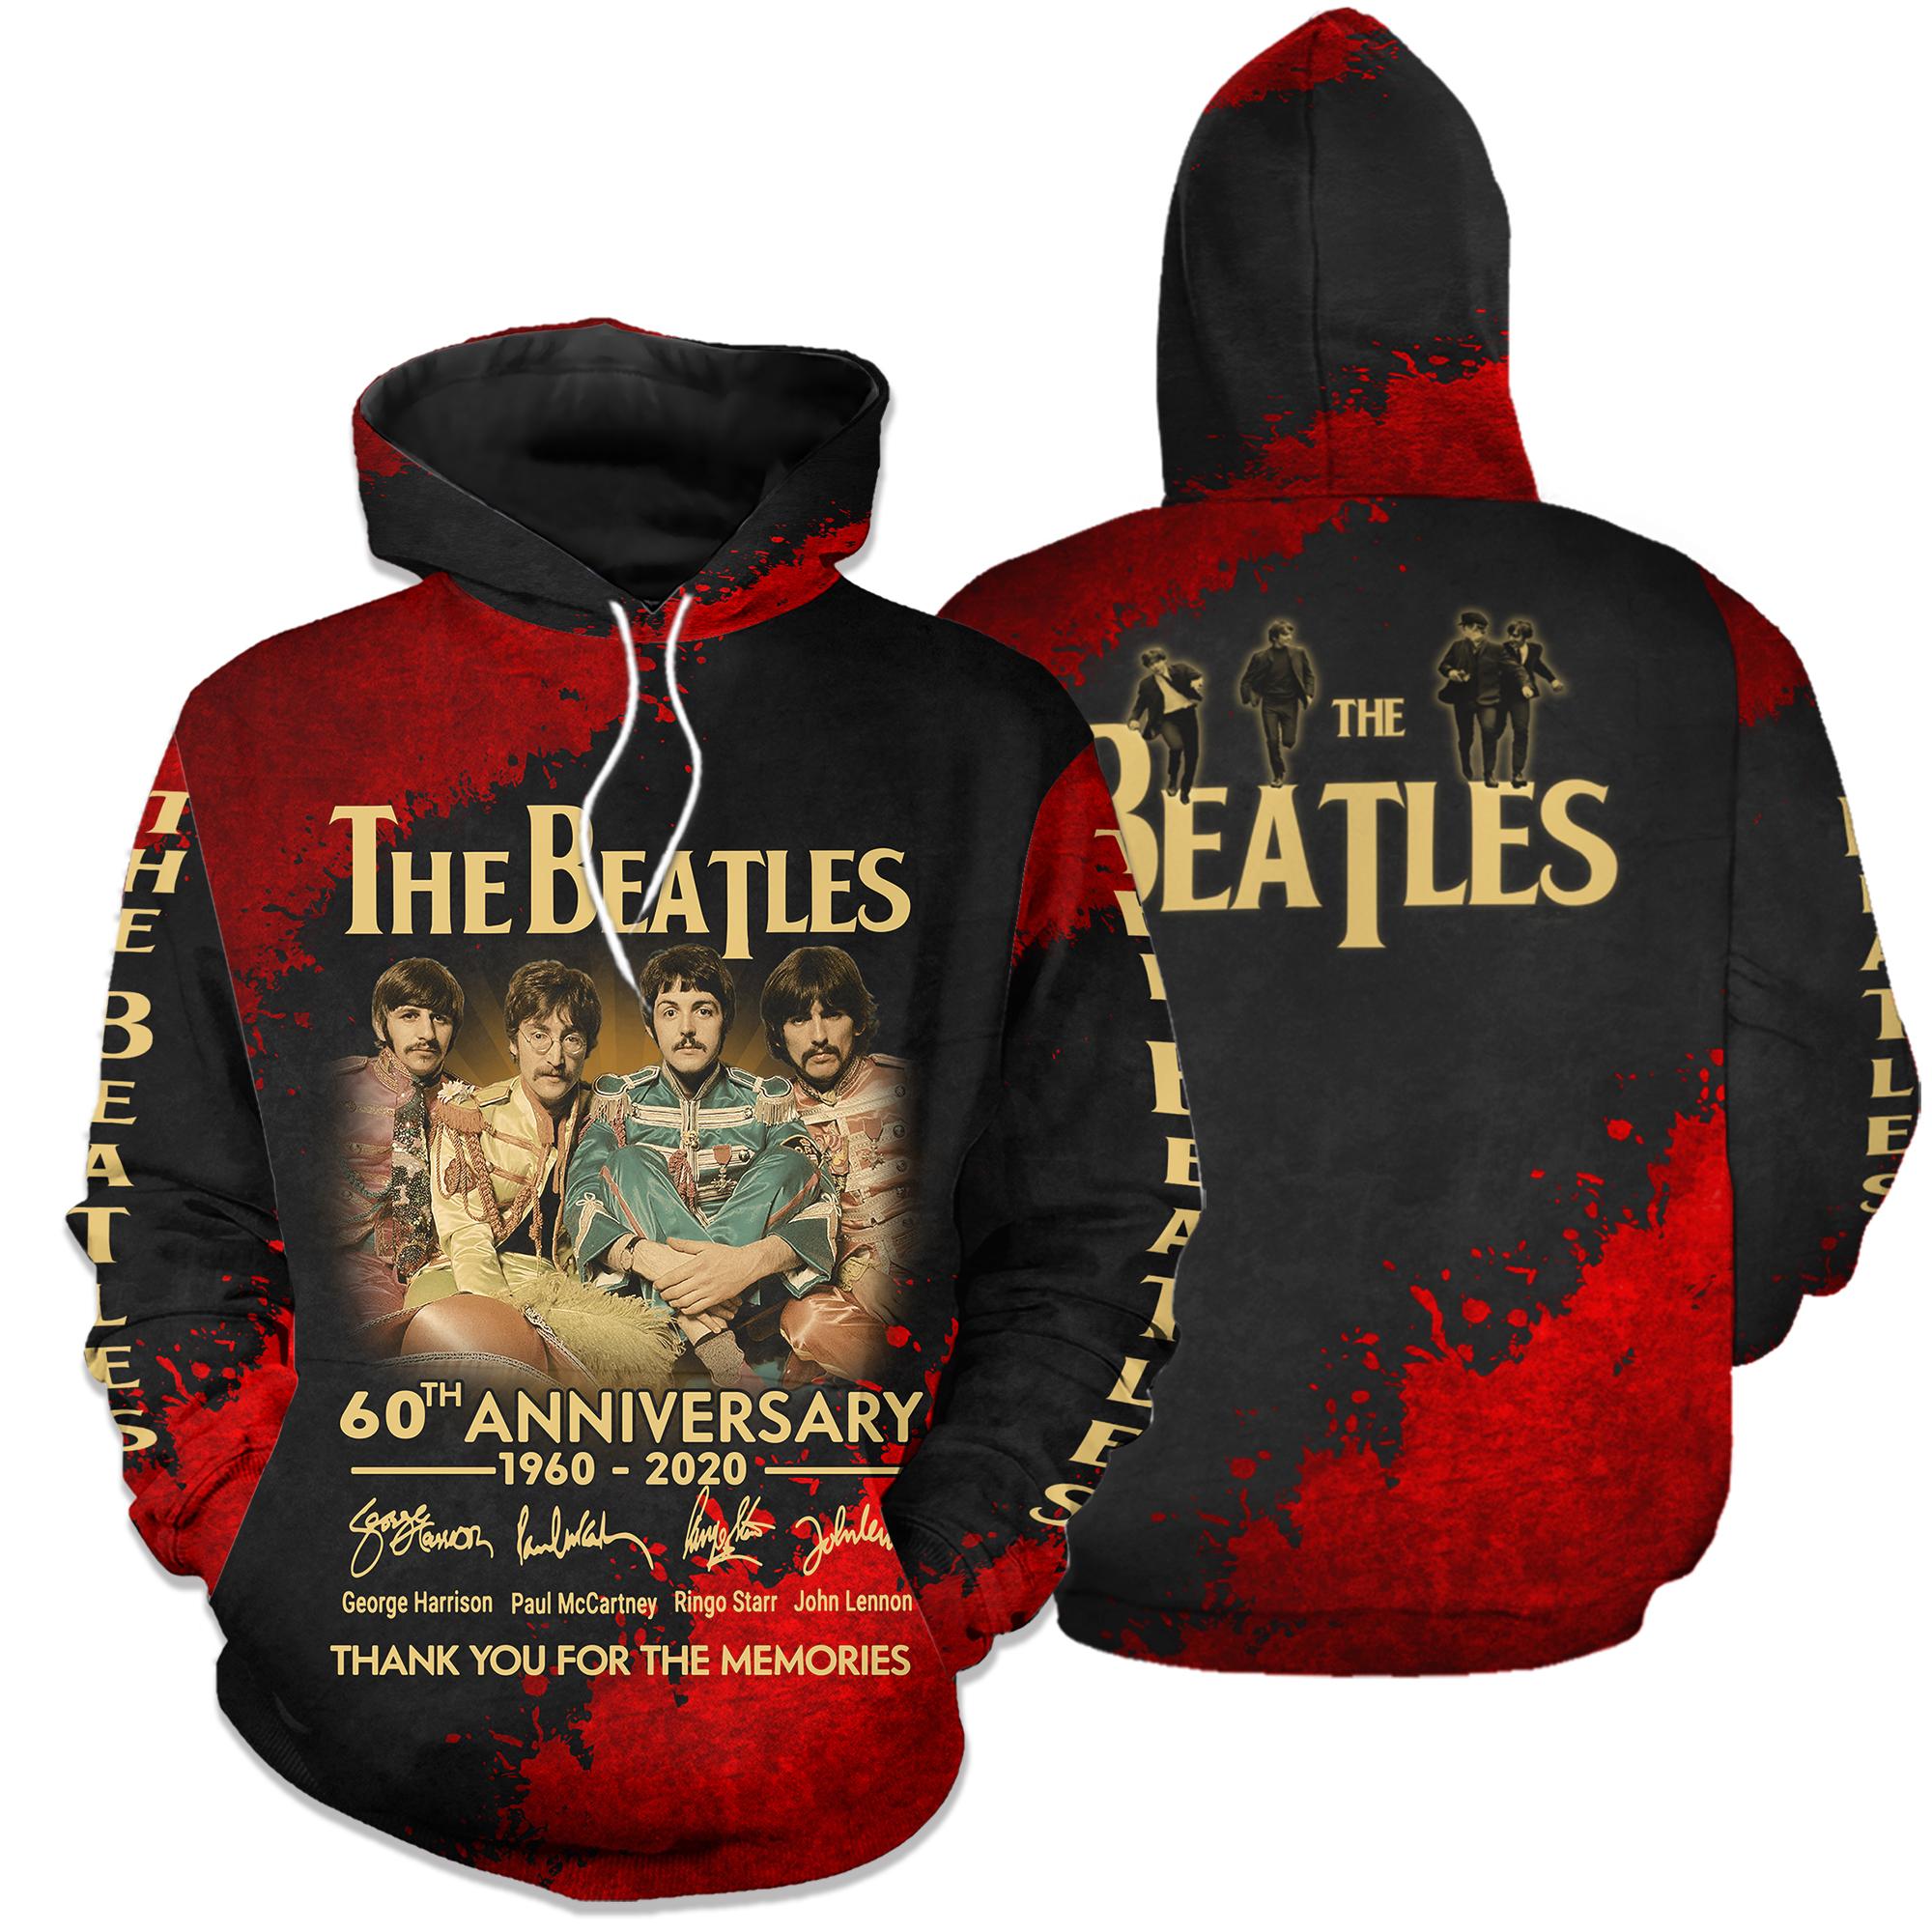 The beatles 60th anniversary 1960-2020 full printing hoodie